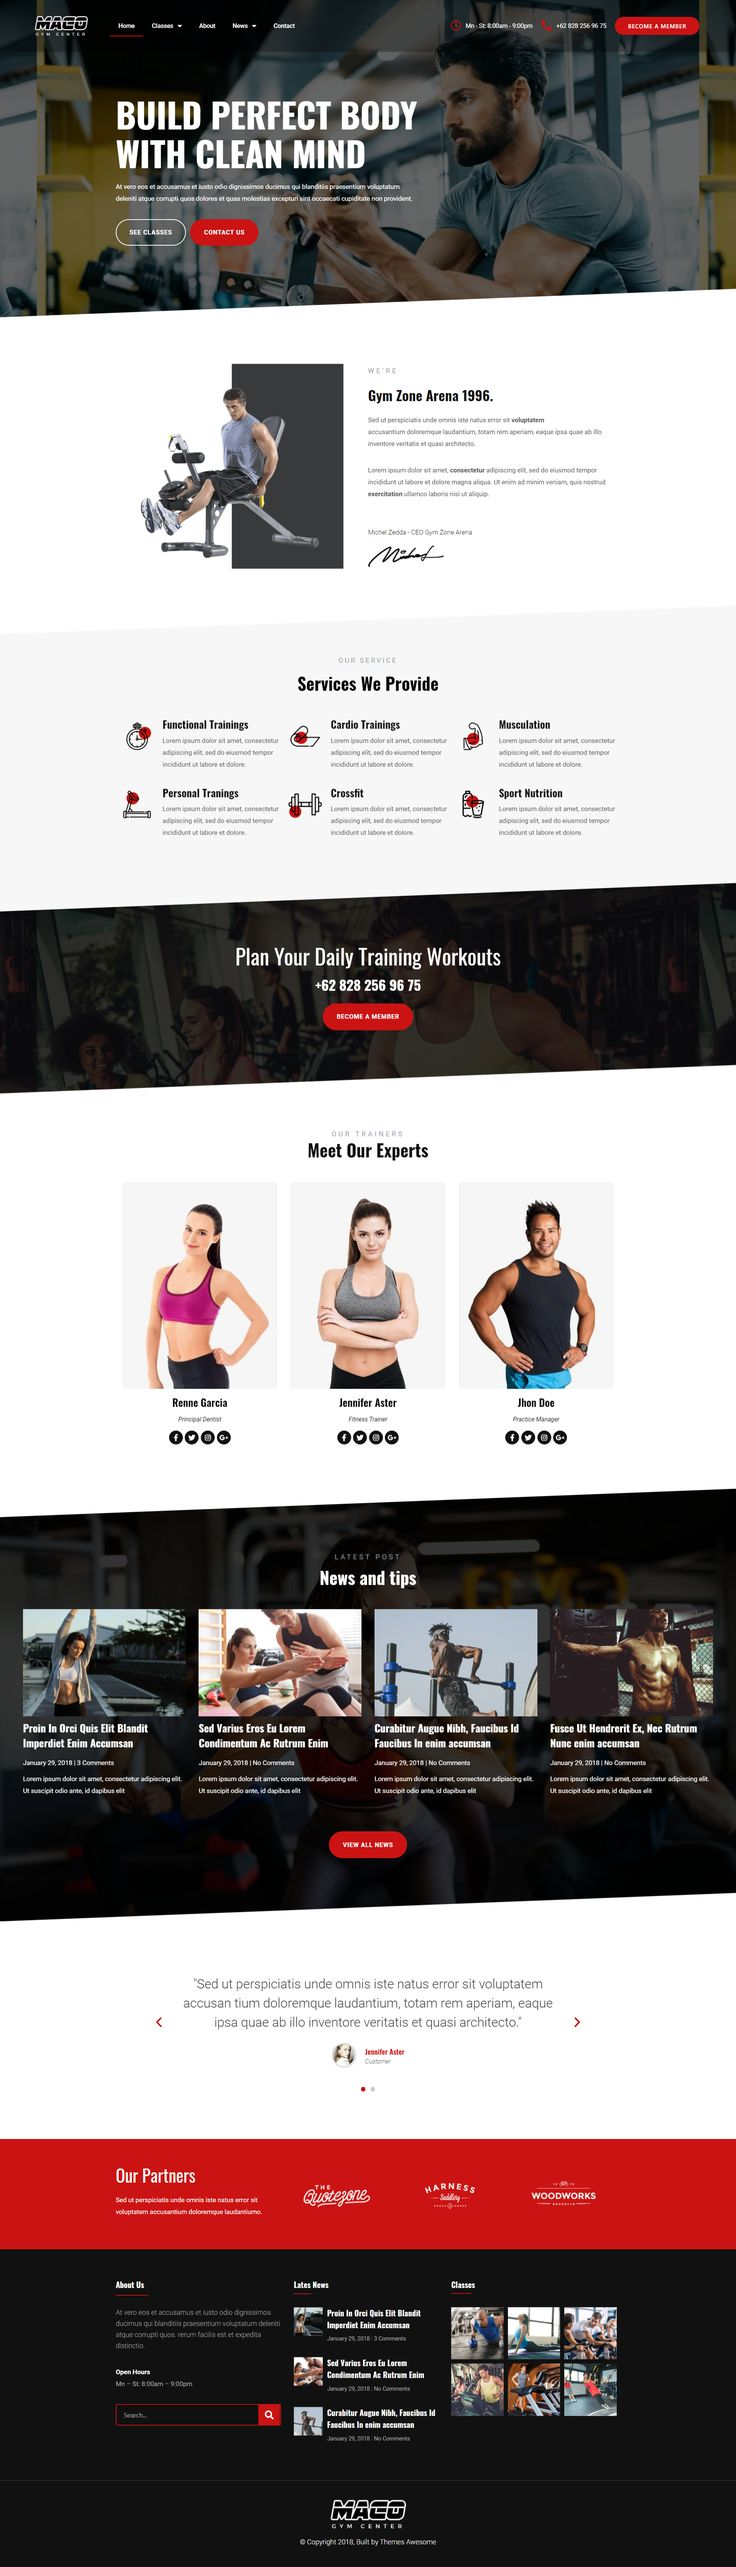 Maco Kit Gym Fitness Website Design In 2021 Fitness Website Design Fitness Training Fitness Website